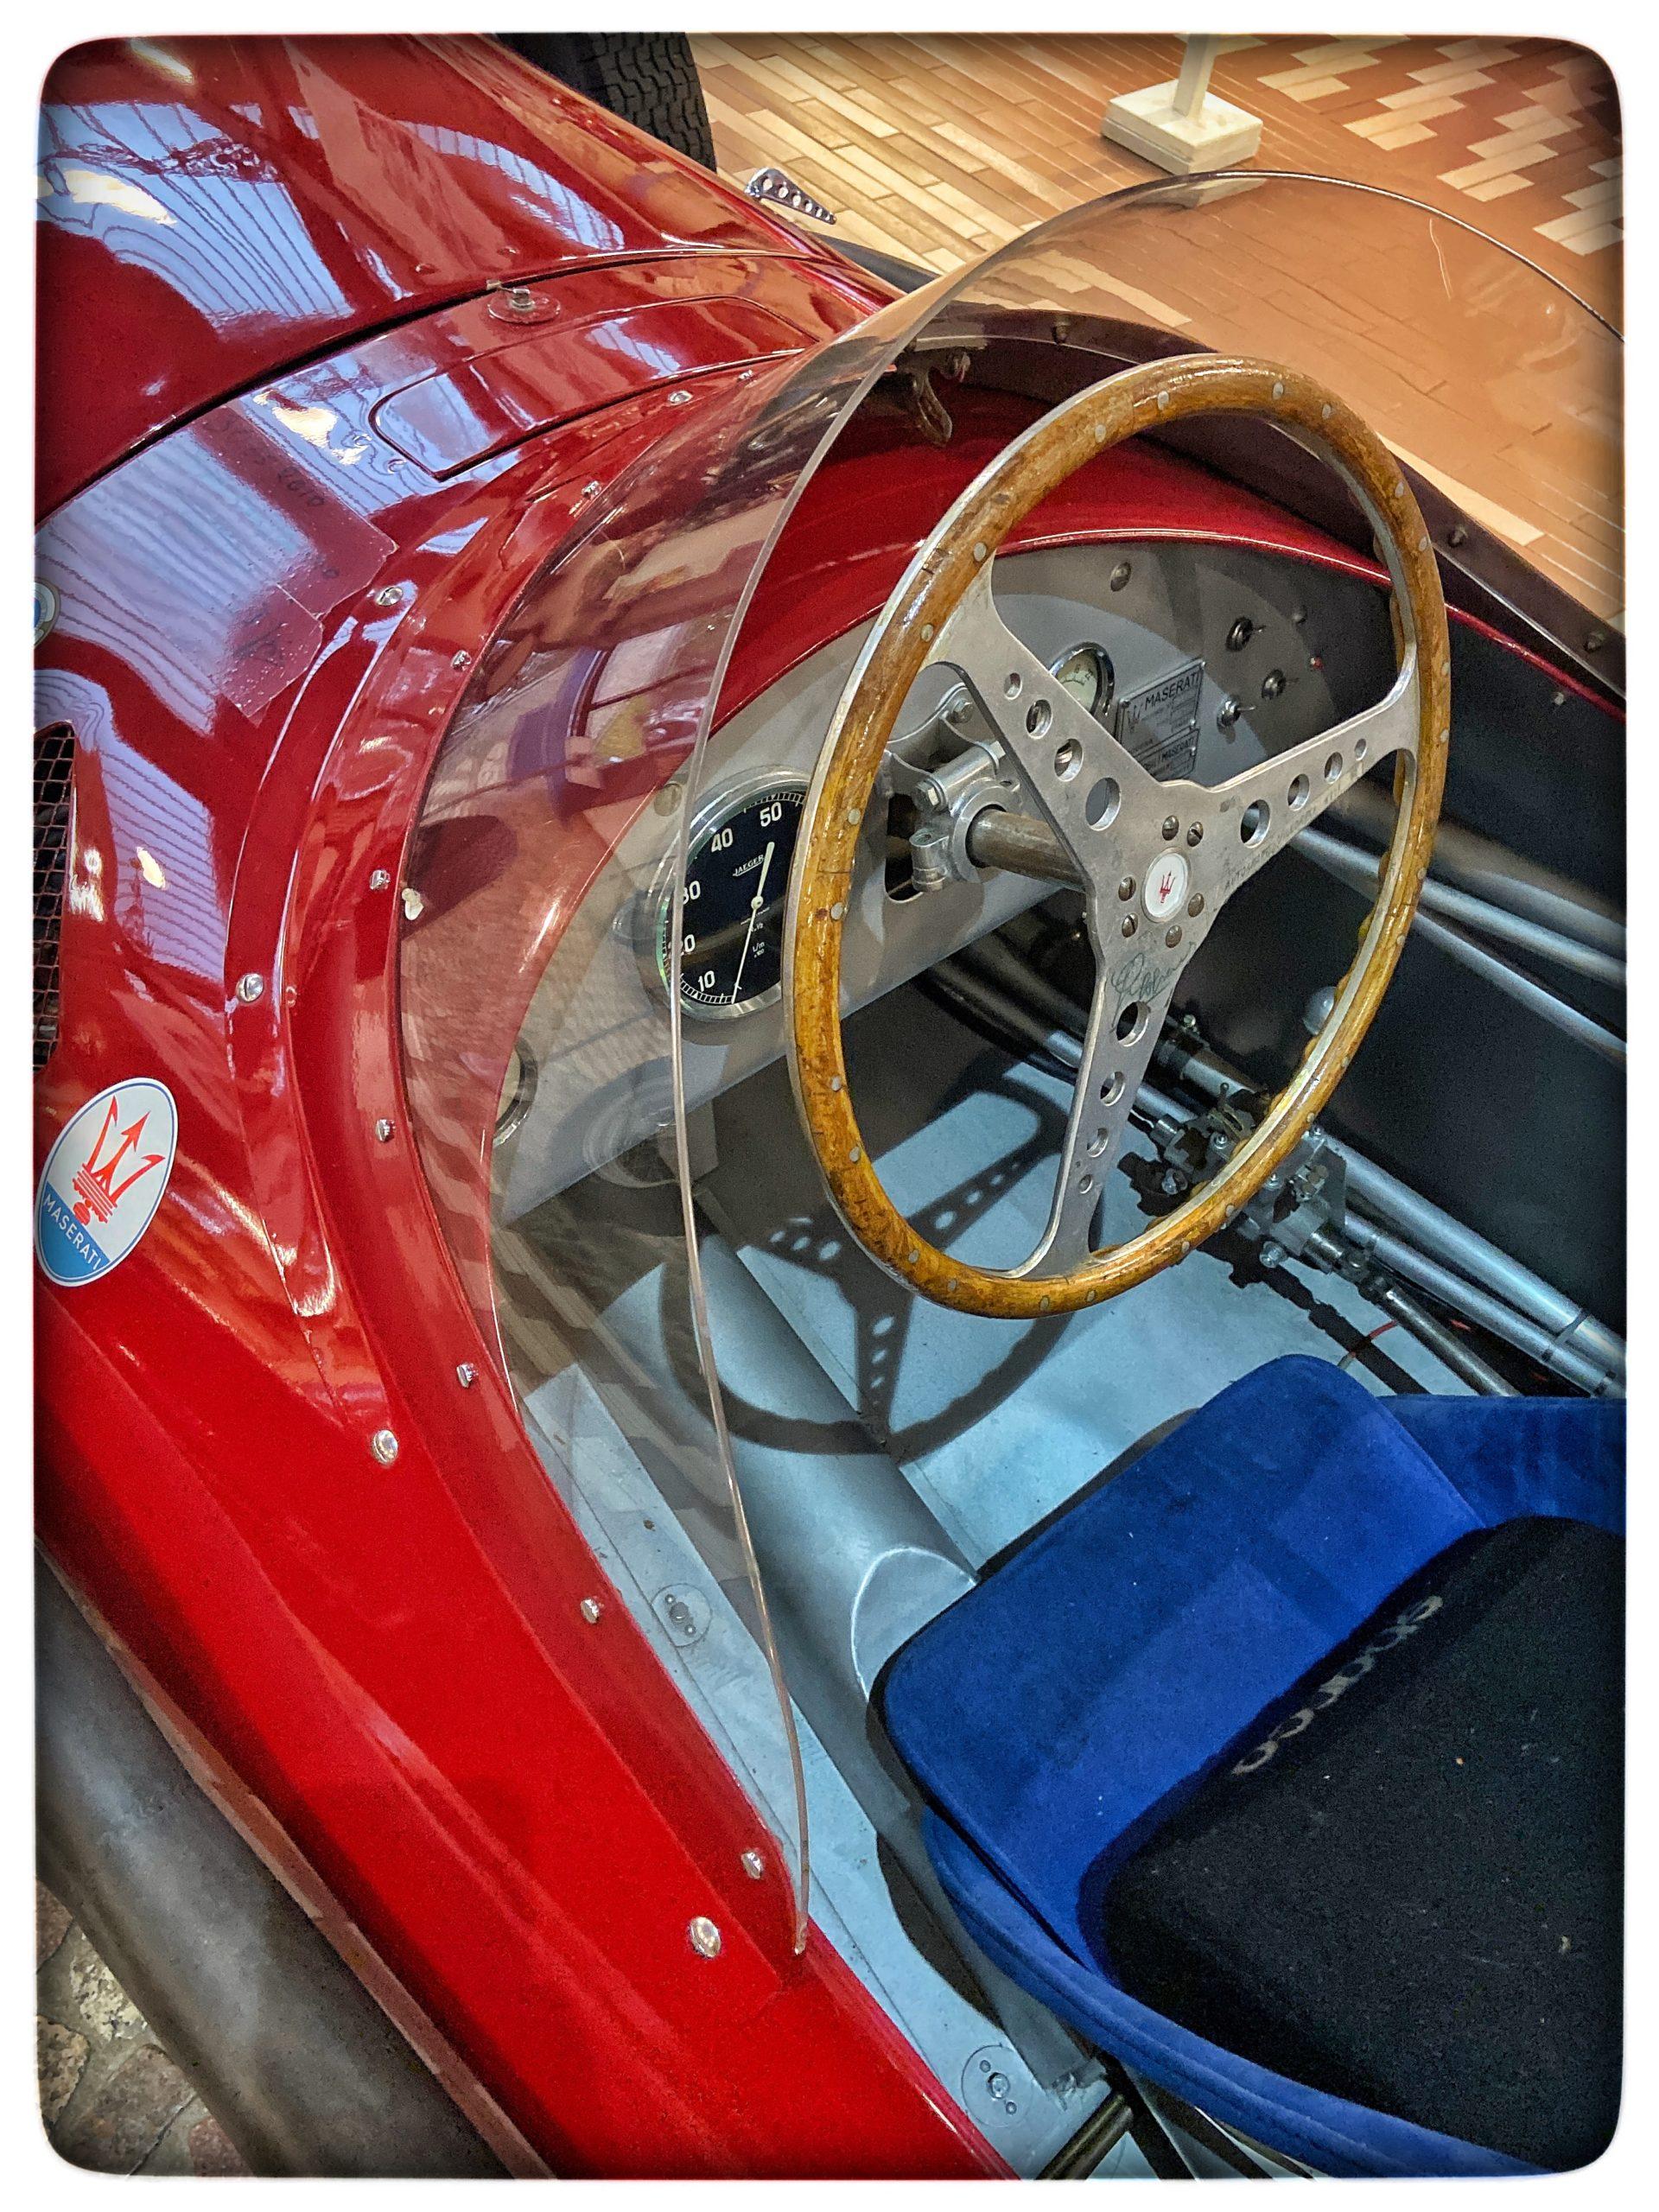 Collection Panini, le musée privé Maserati